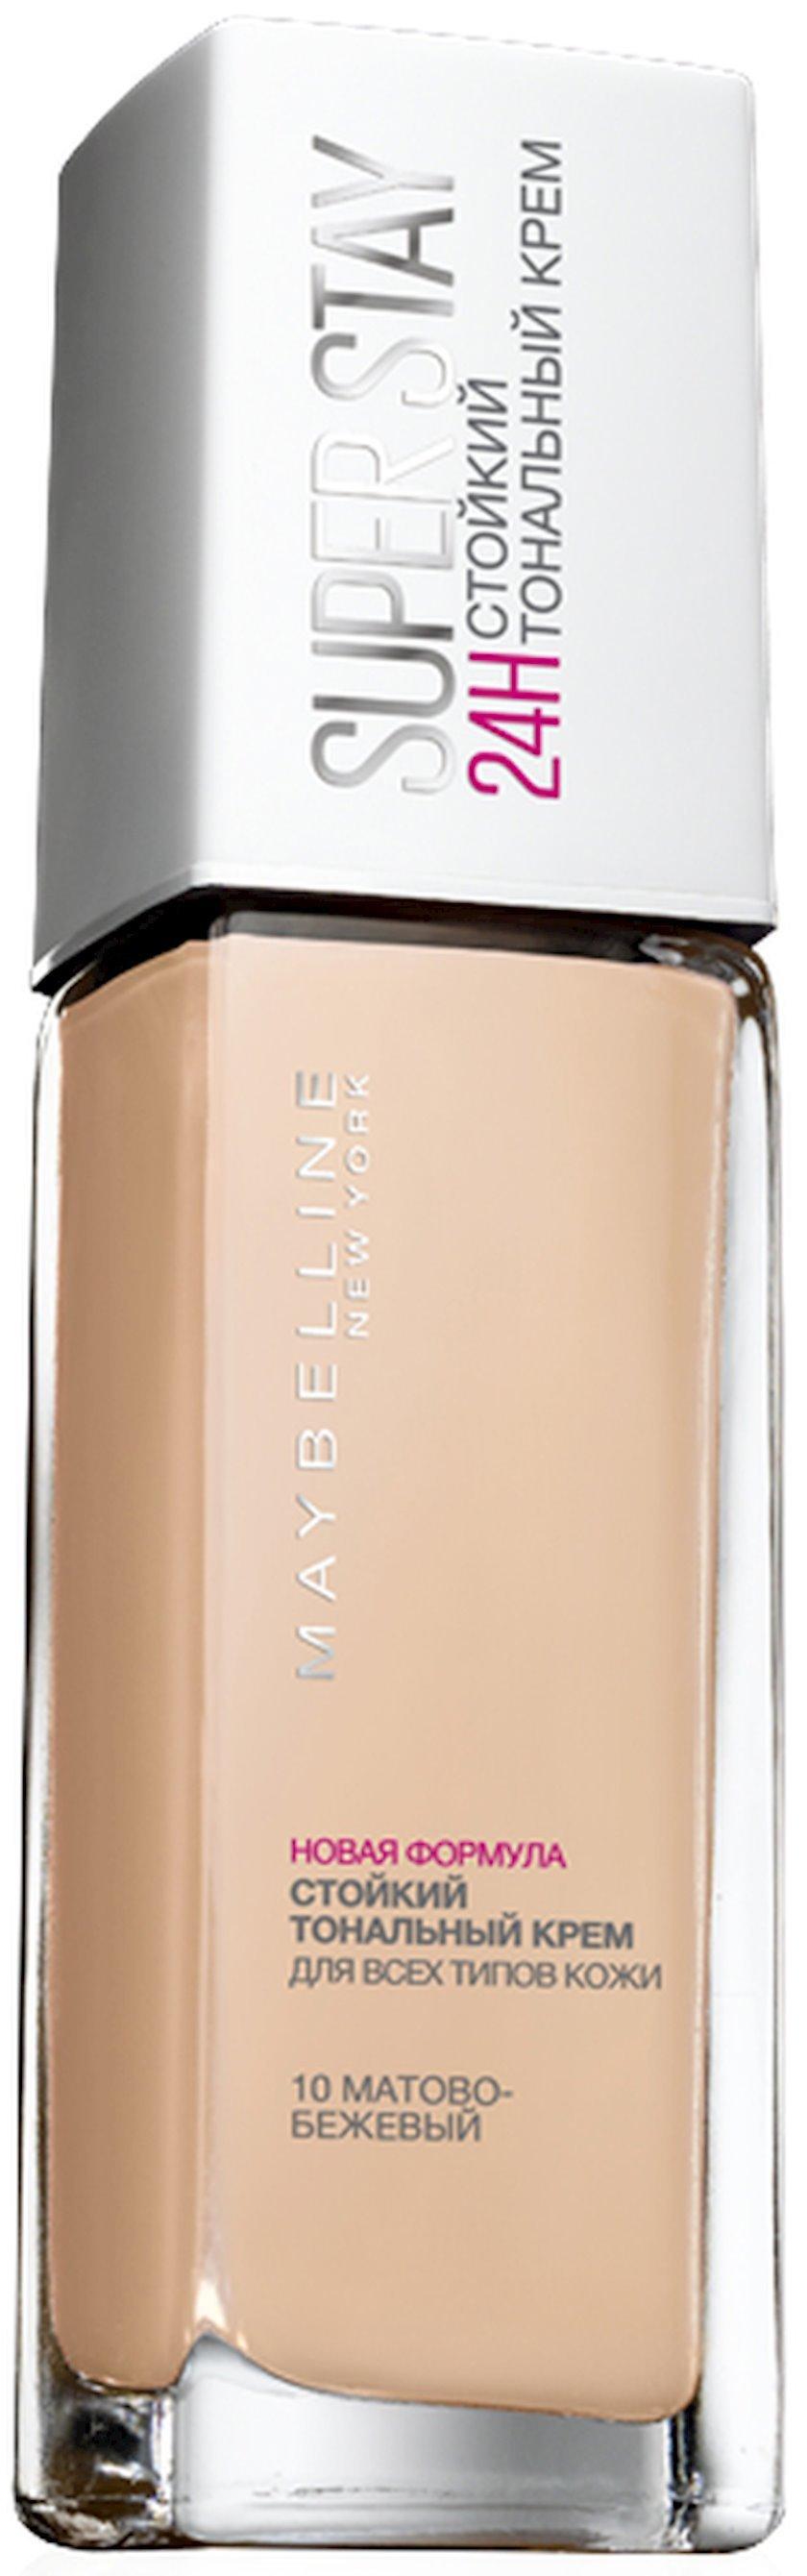 Tonal krem Maybelline New York SuperStay 24H çalar 10 Mat bej 30 ml